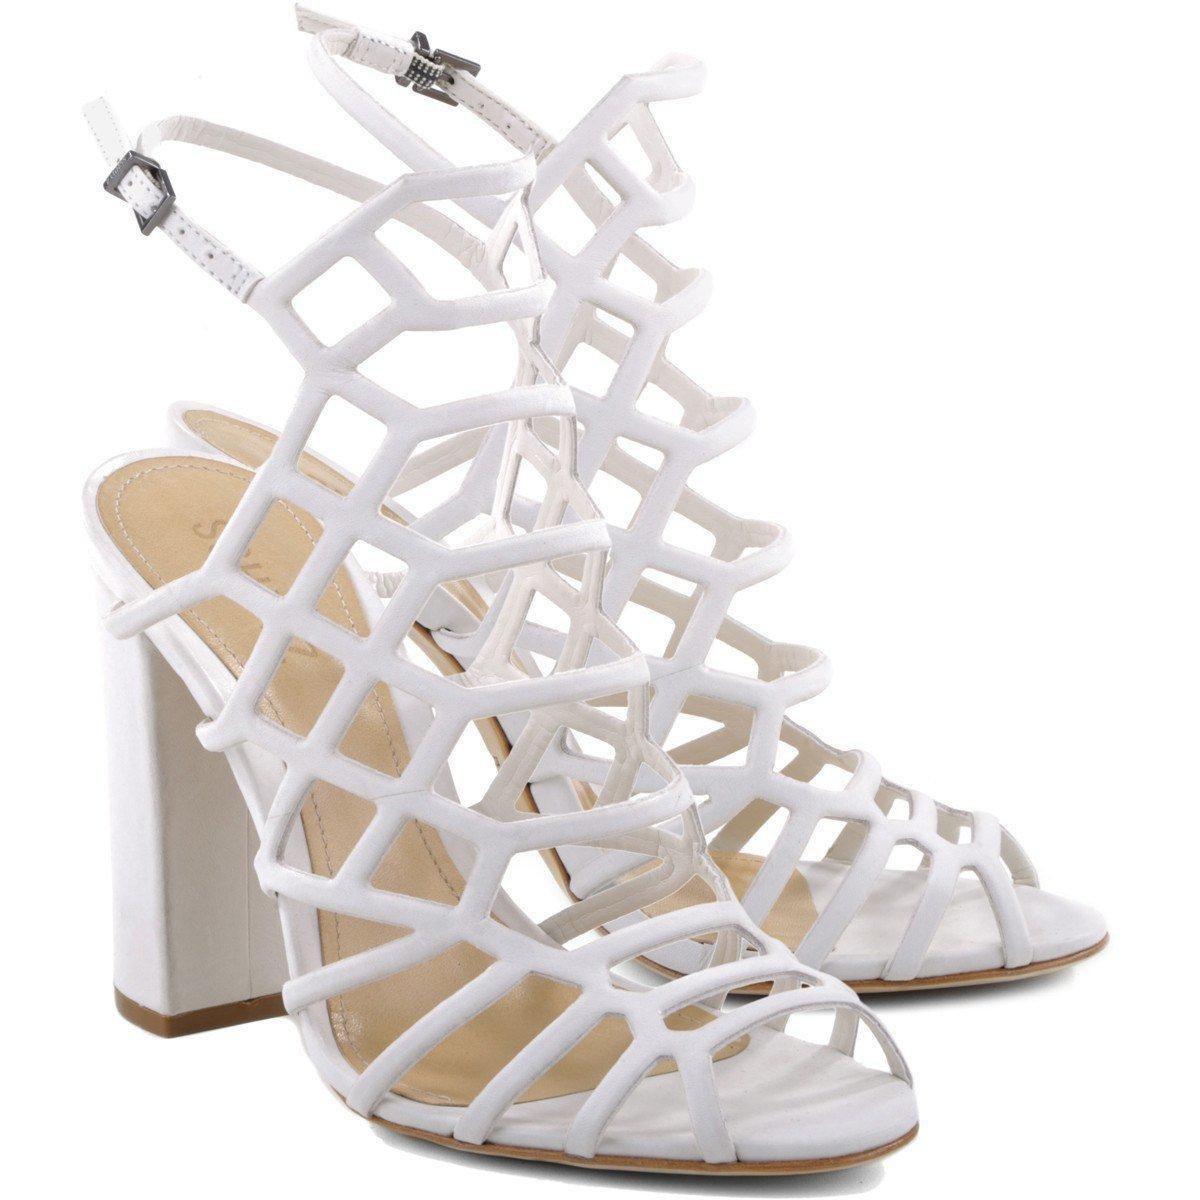 SCHUTZ Womens Jaden Dress Sandal Pearl White Leather Caged Block Heel